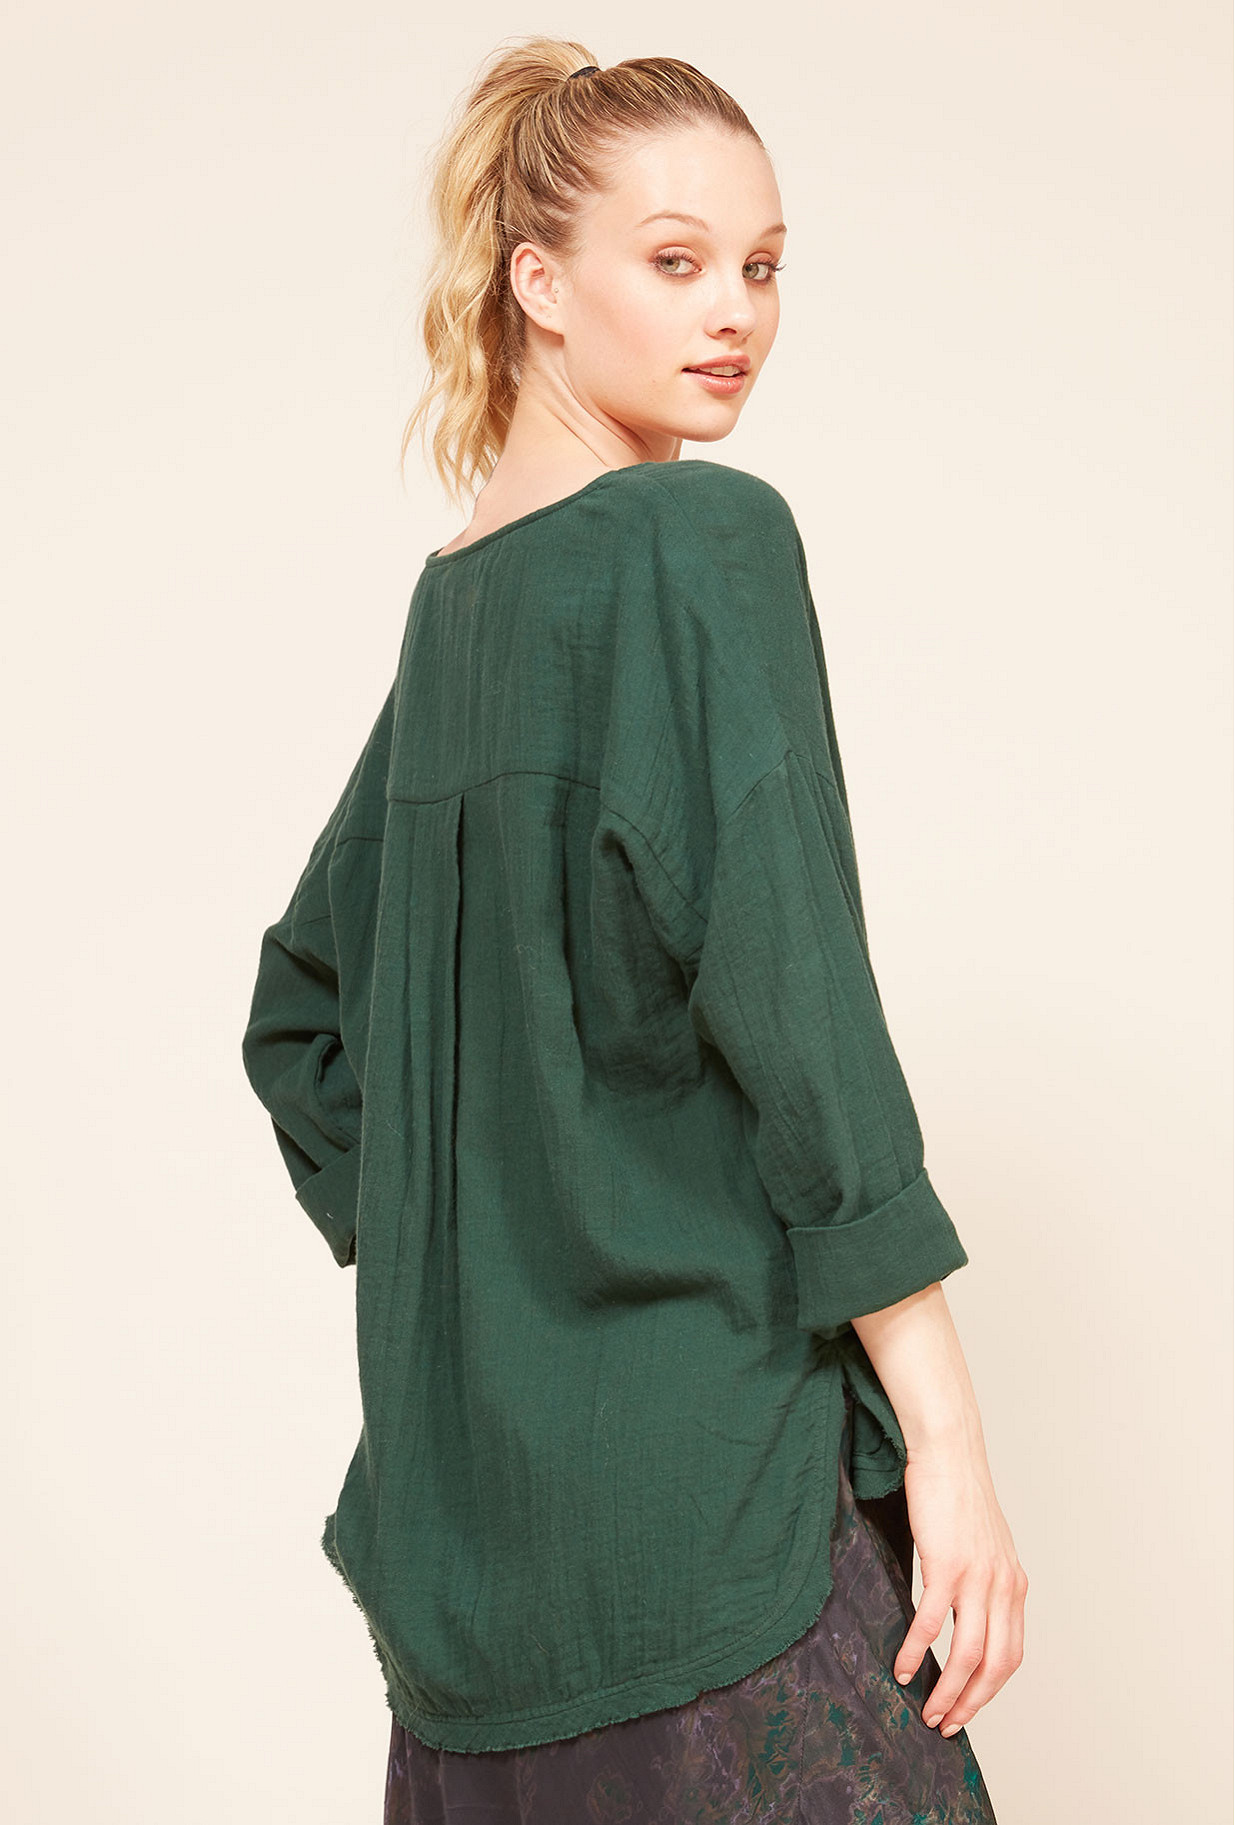 Green Blouse Digest